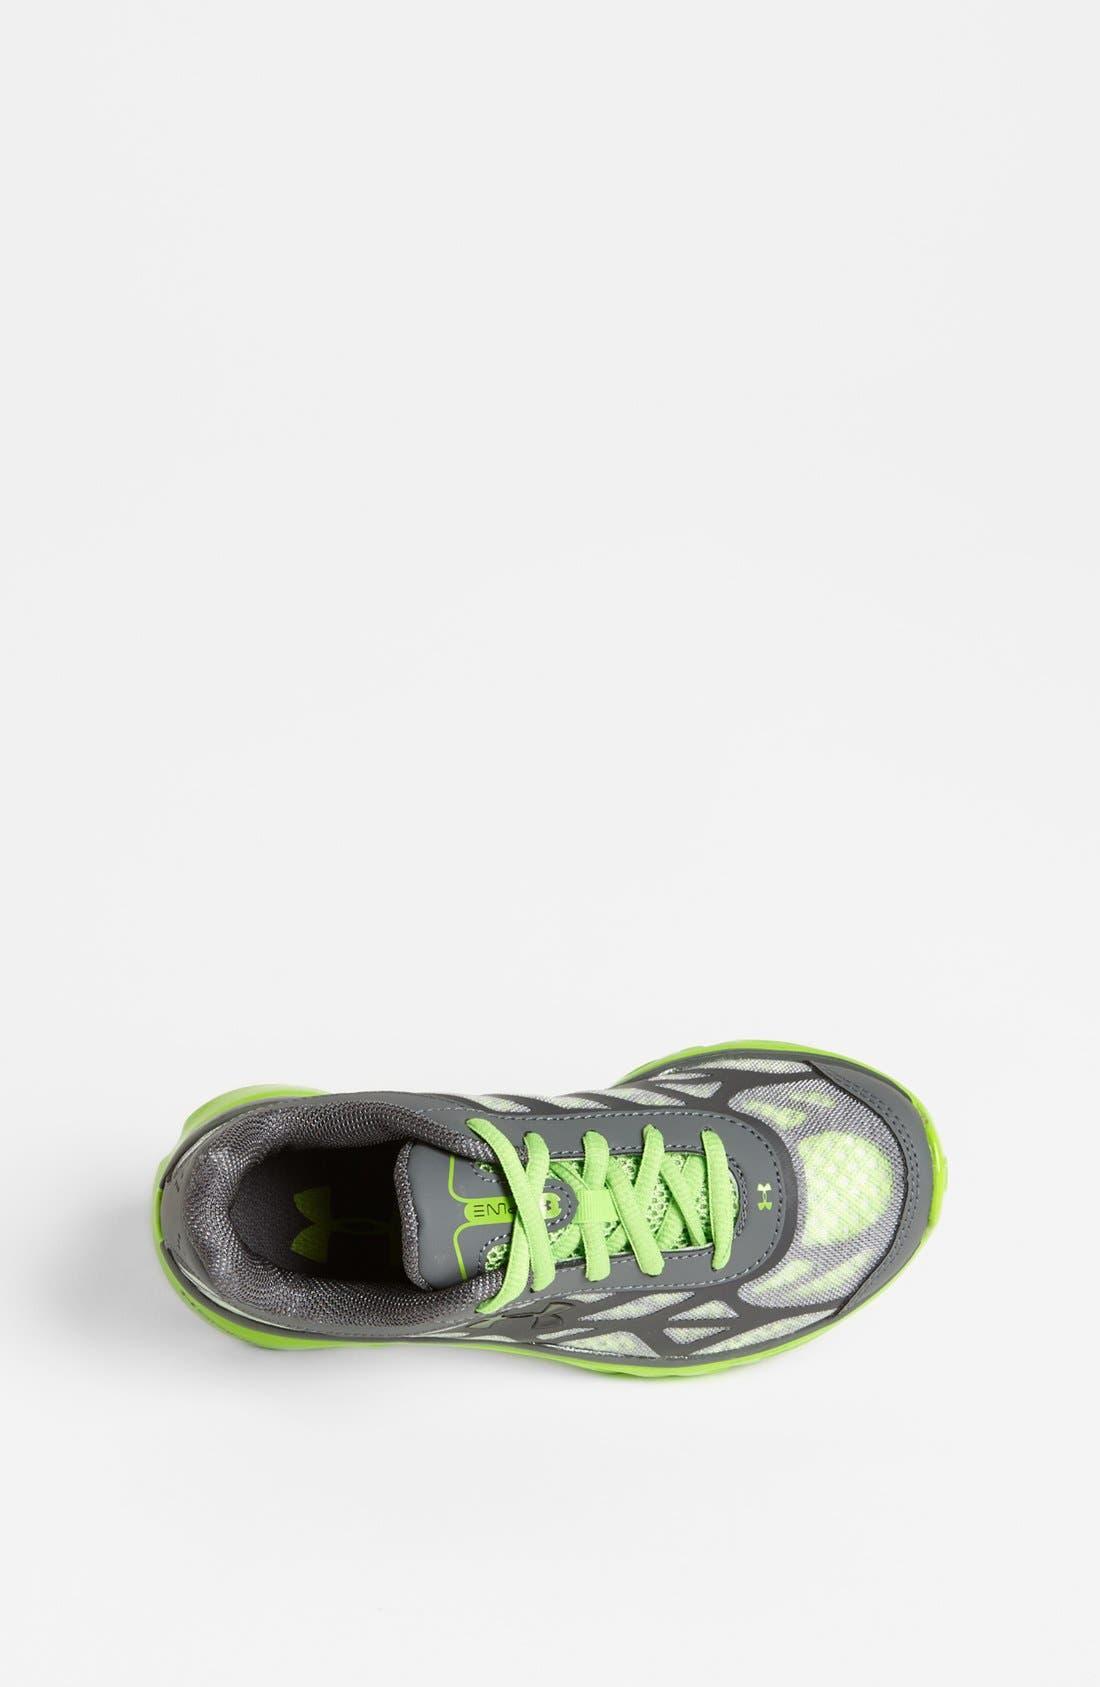 Alternate Image 3  - Under Armour 'Spine™ Vice' Athletic Shoe (Toddler, Little Kid & Big Kid)